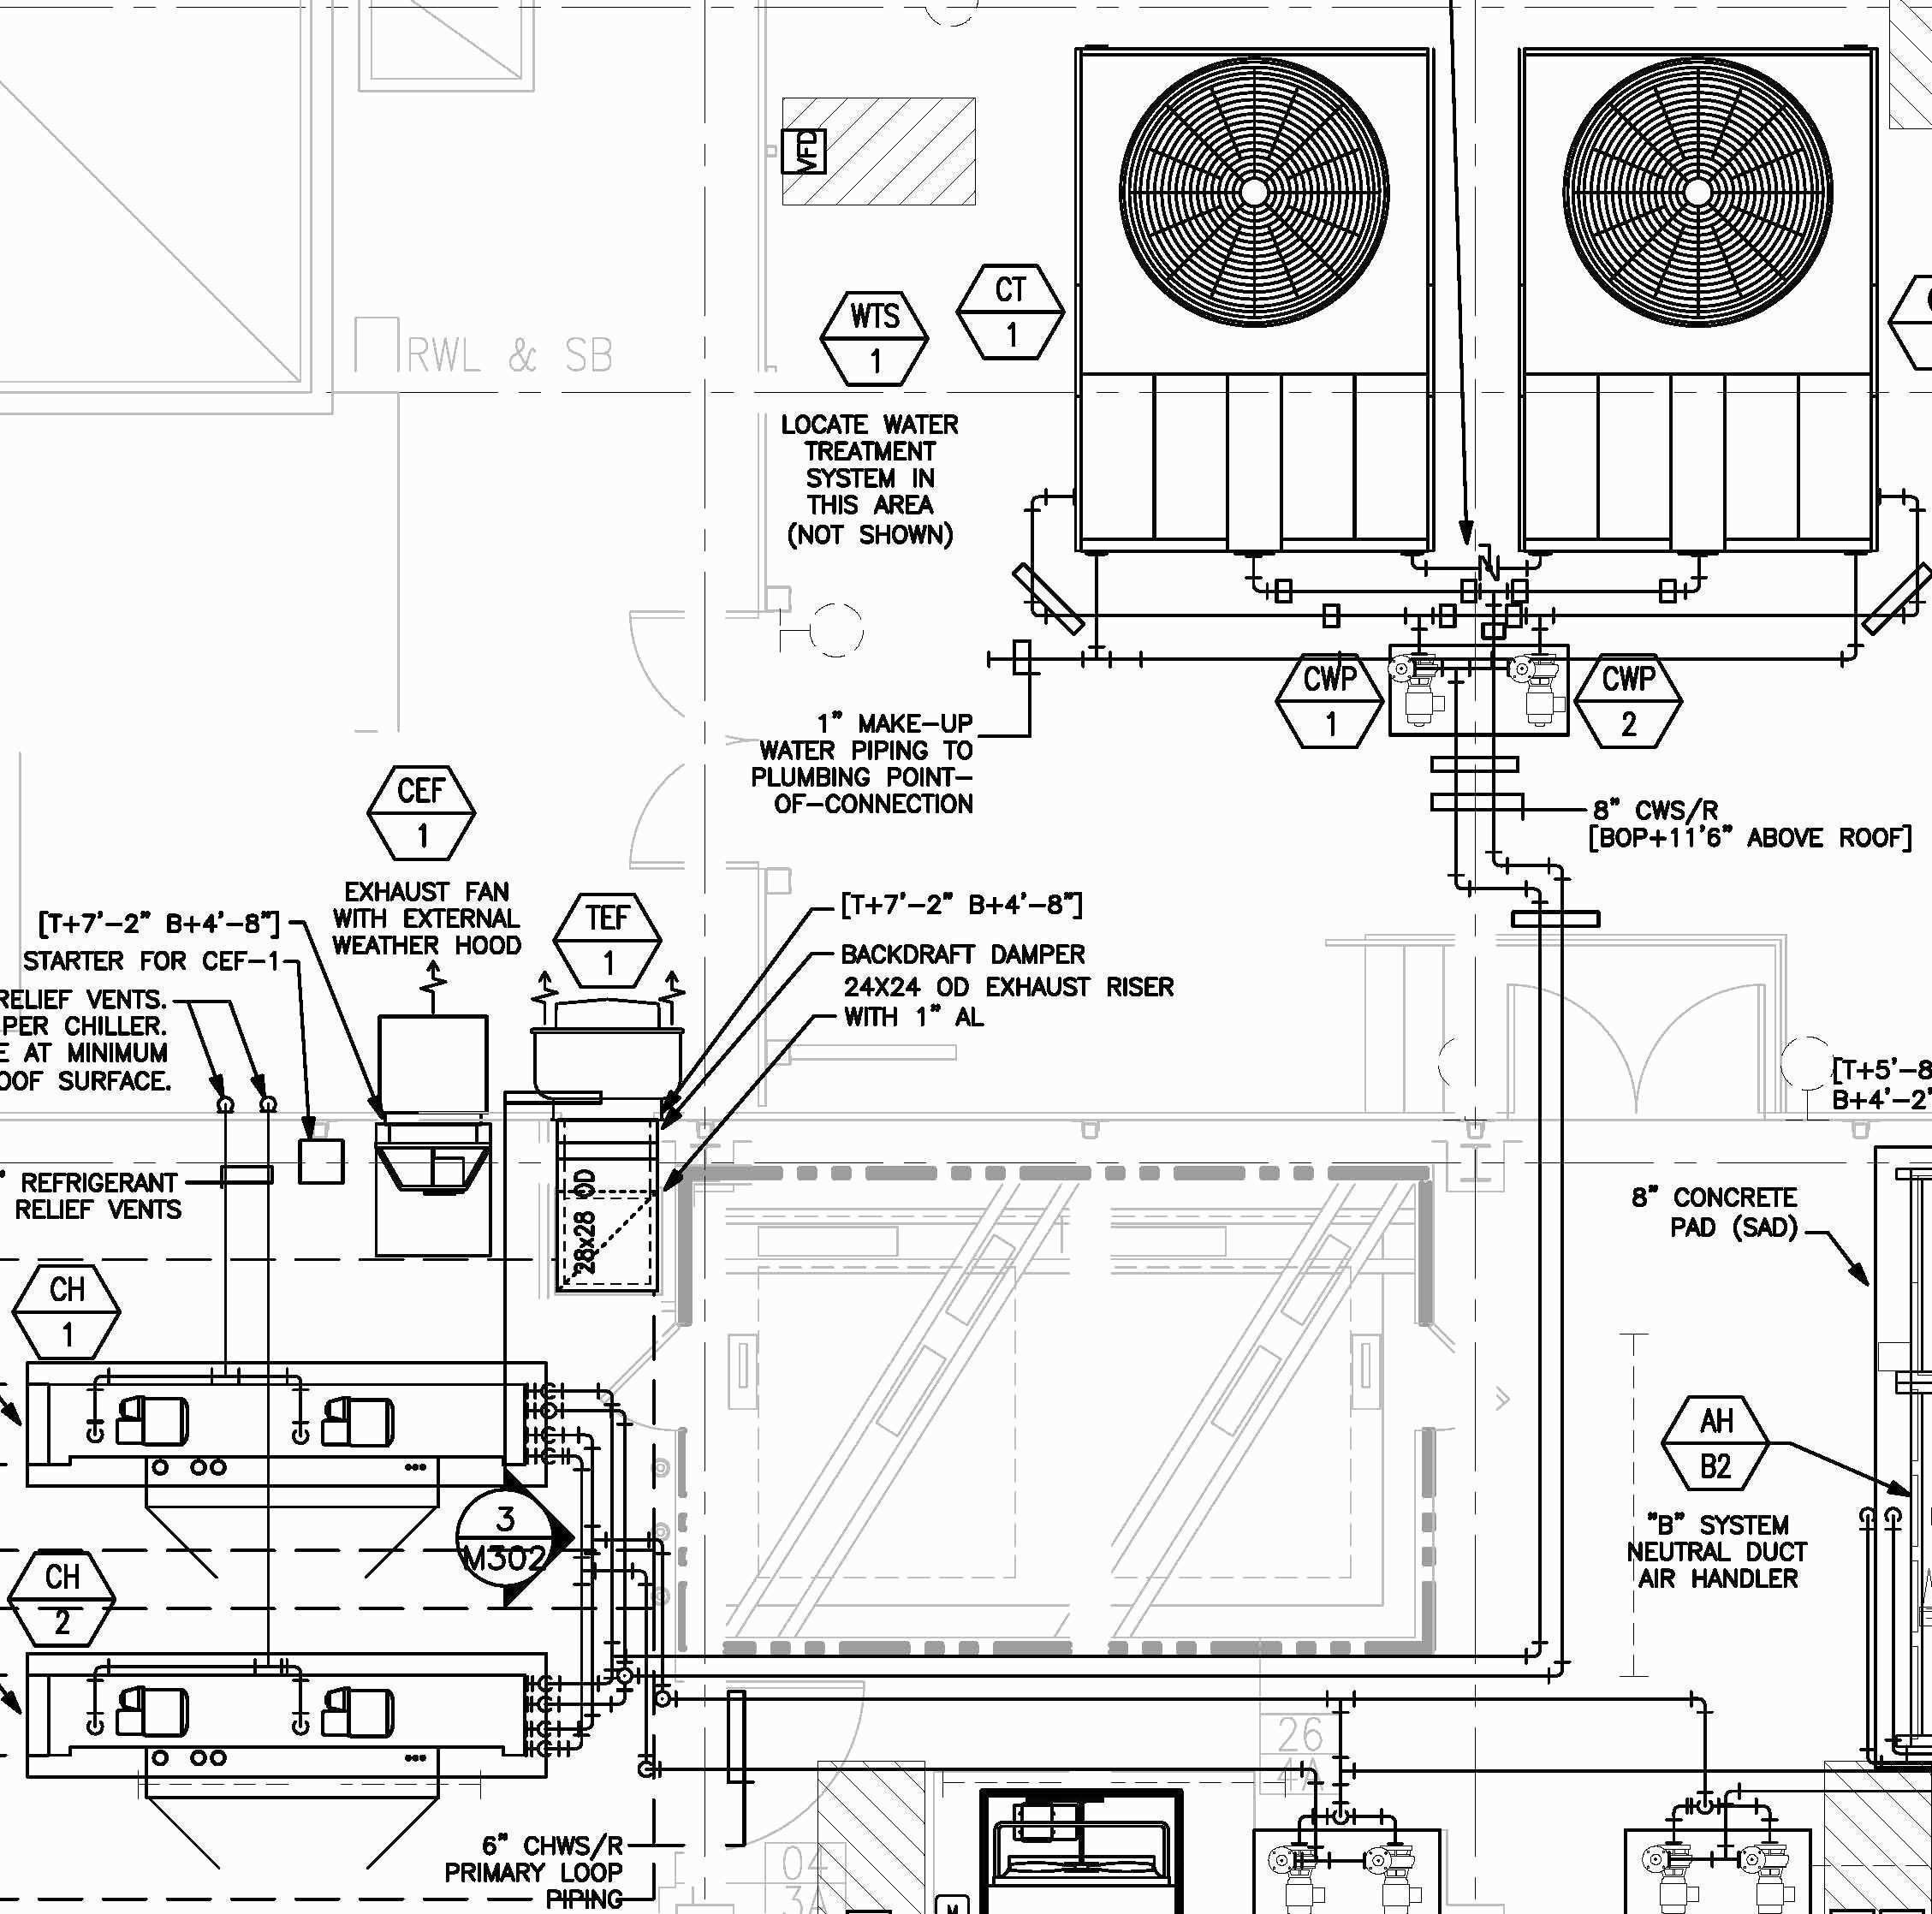 Automotive Air Conditioning System Diagram Piping Diagram Ac Wiring Diagrams Lol Of Automotive Air Conditioning System Diagram